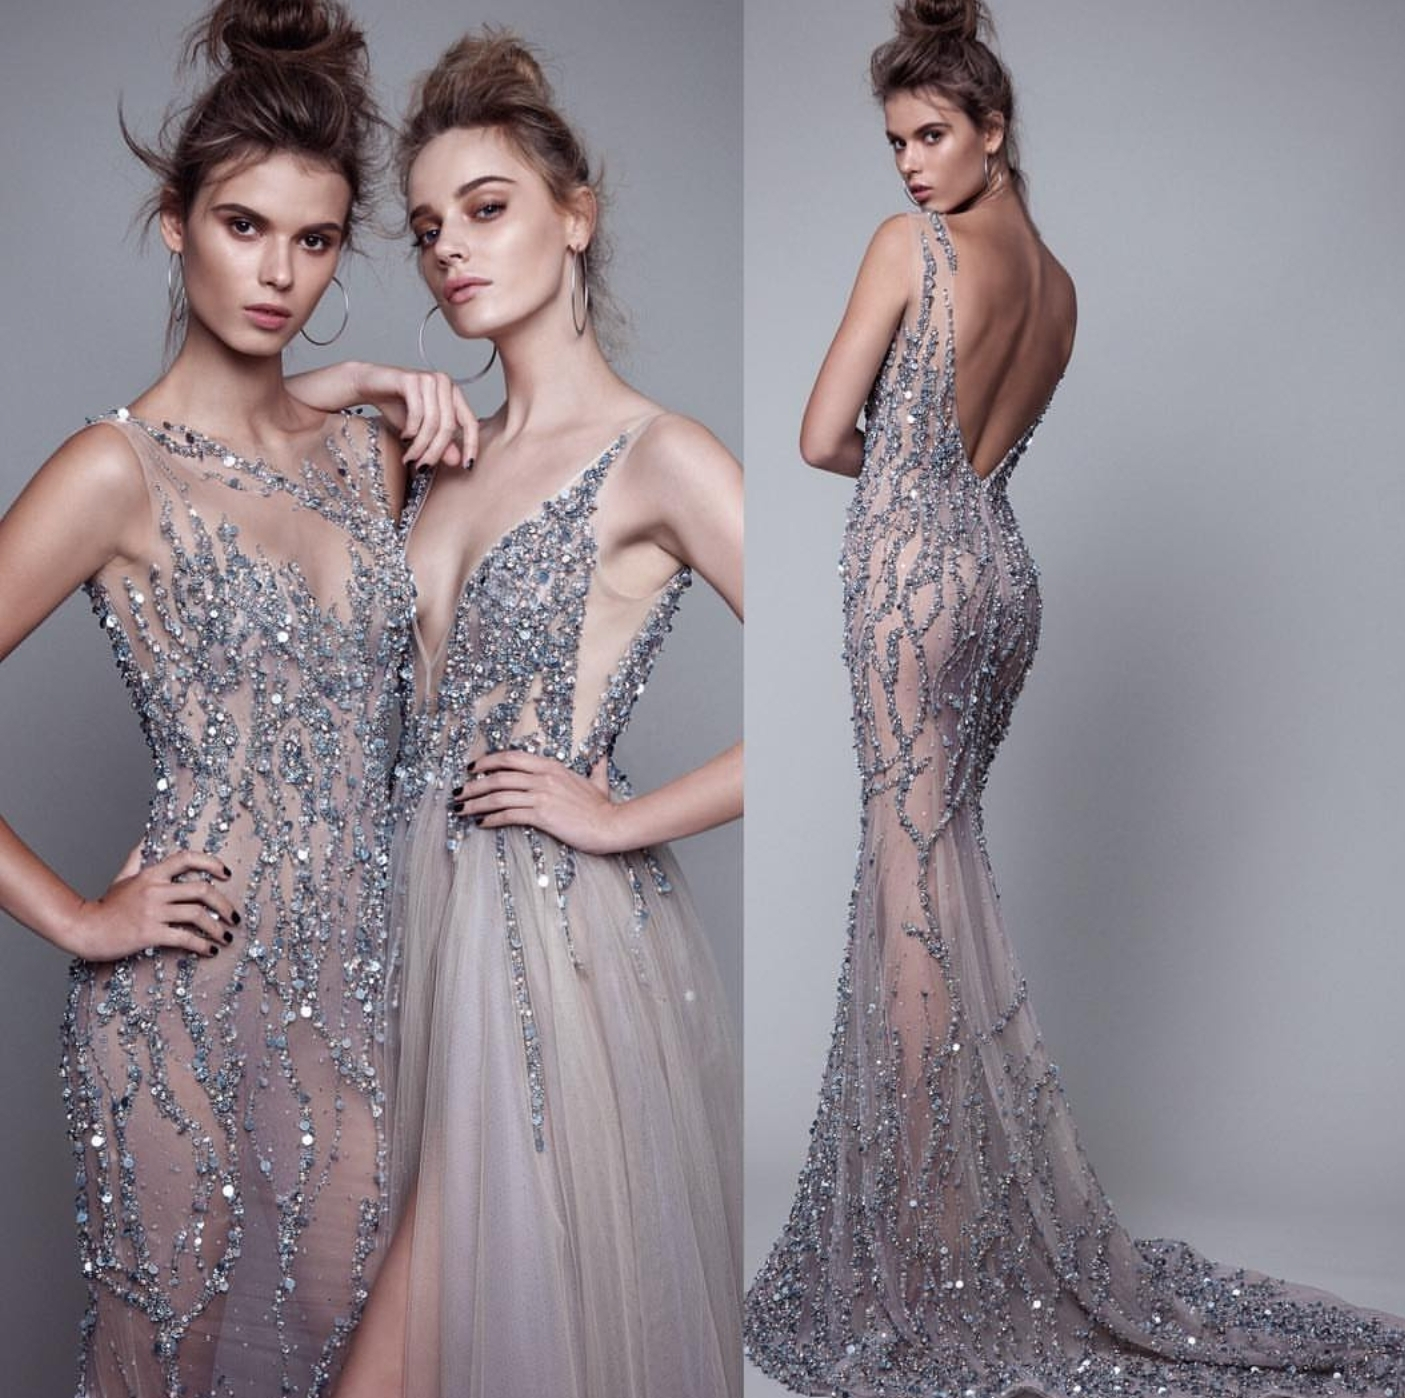 картинка Вечернее платье LUX1 интернет бутик Avolet.ru